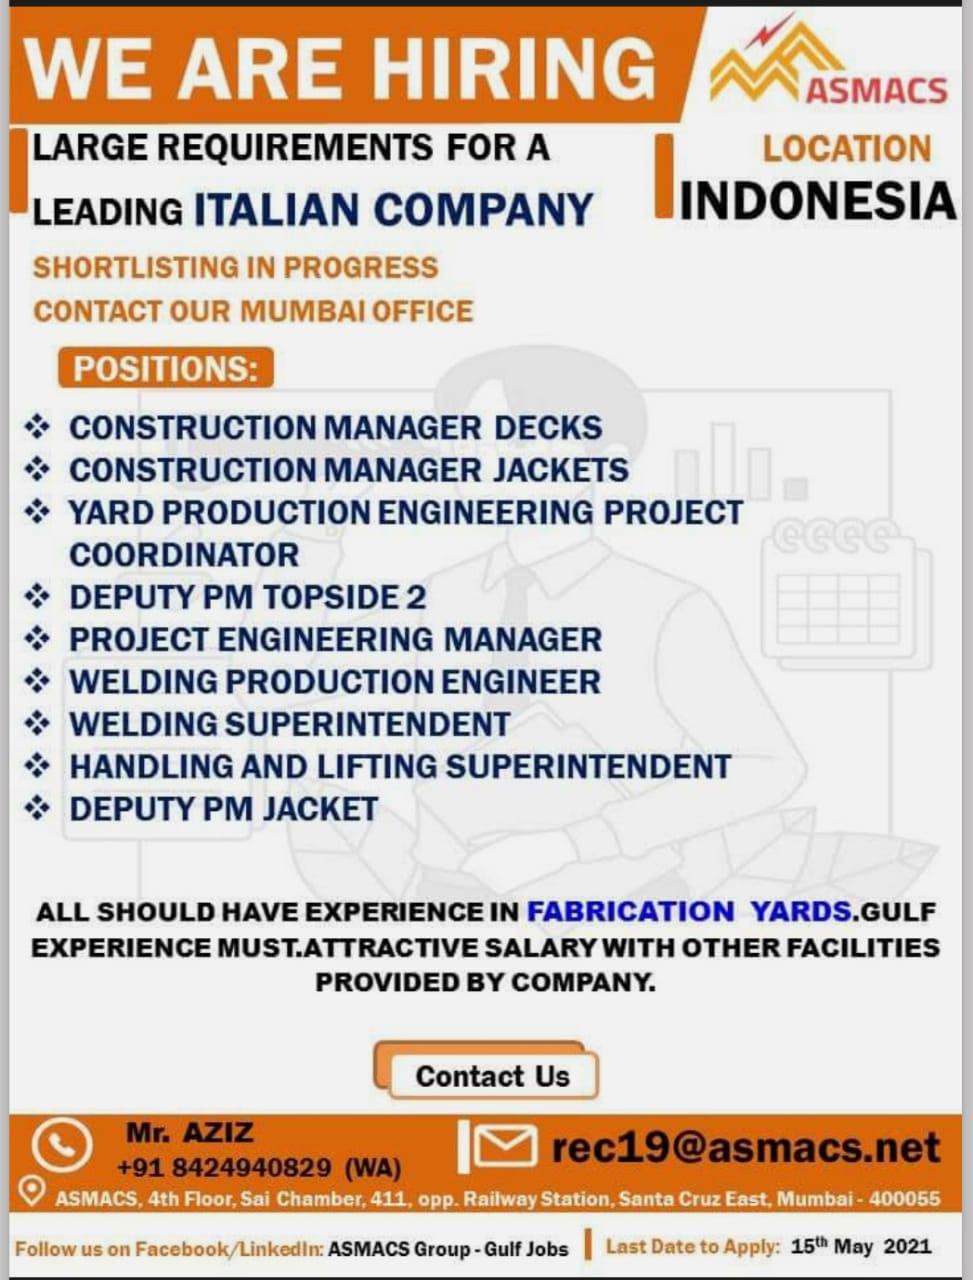 WALK IN INTERVIEWS AT MUMBAI FOR INDONESIA ITALIAN COMPANY